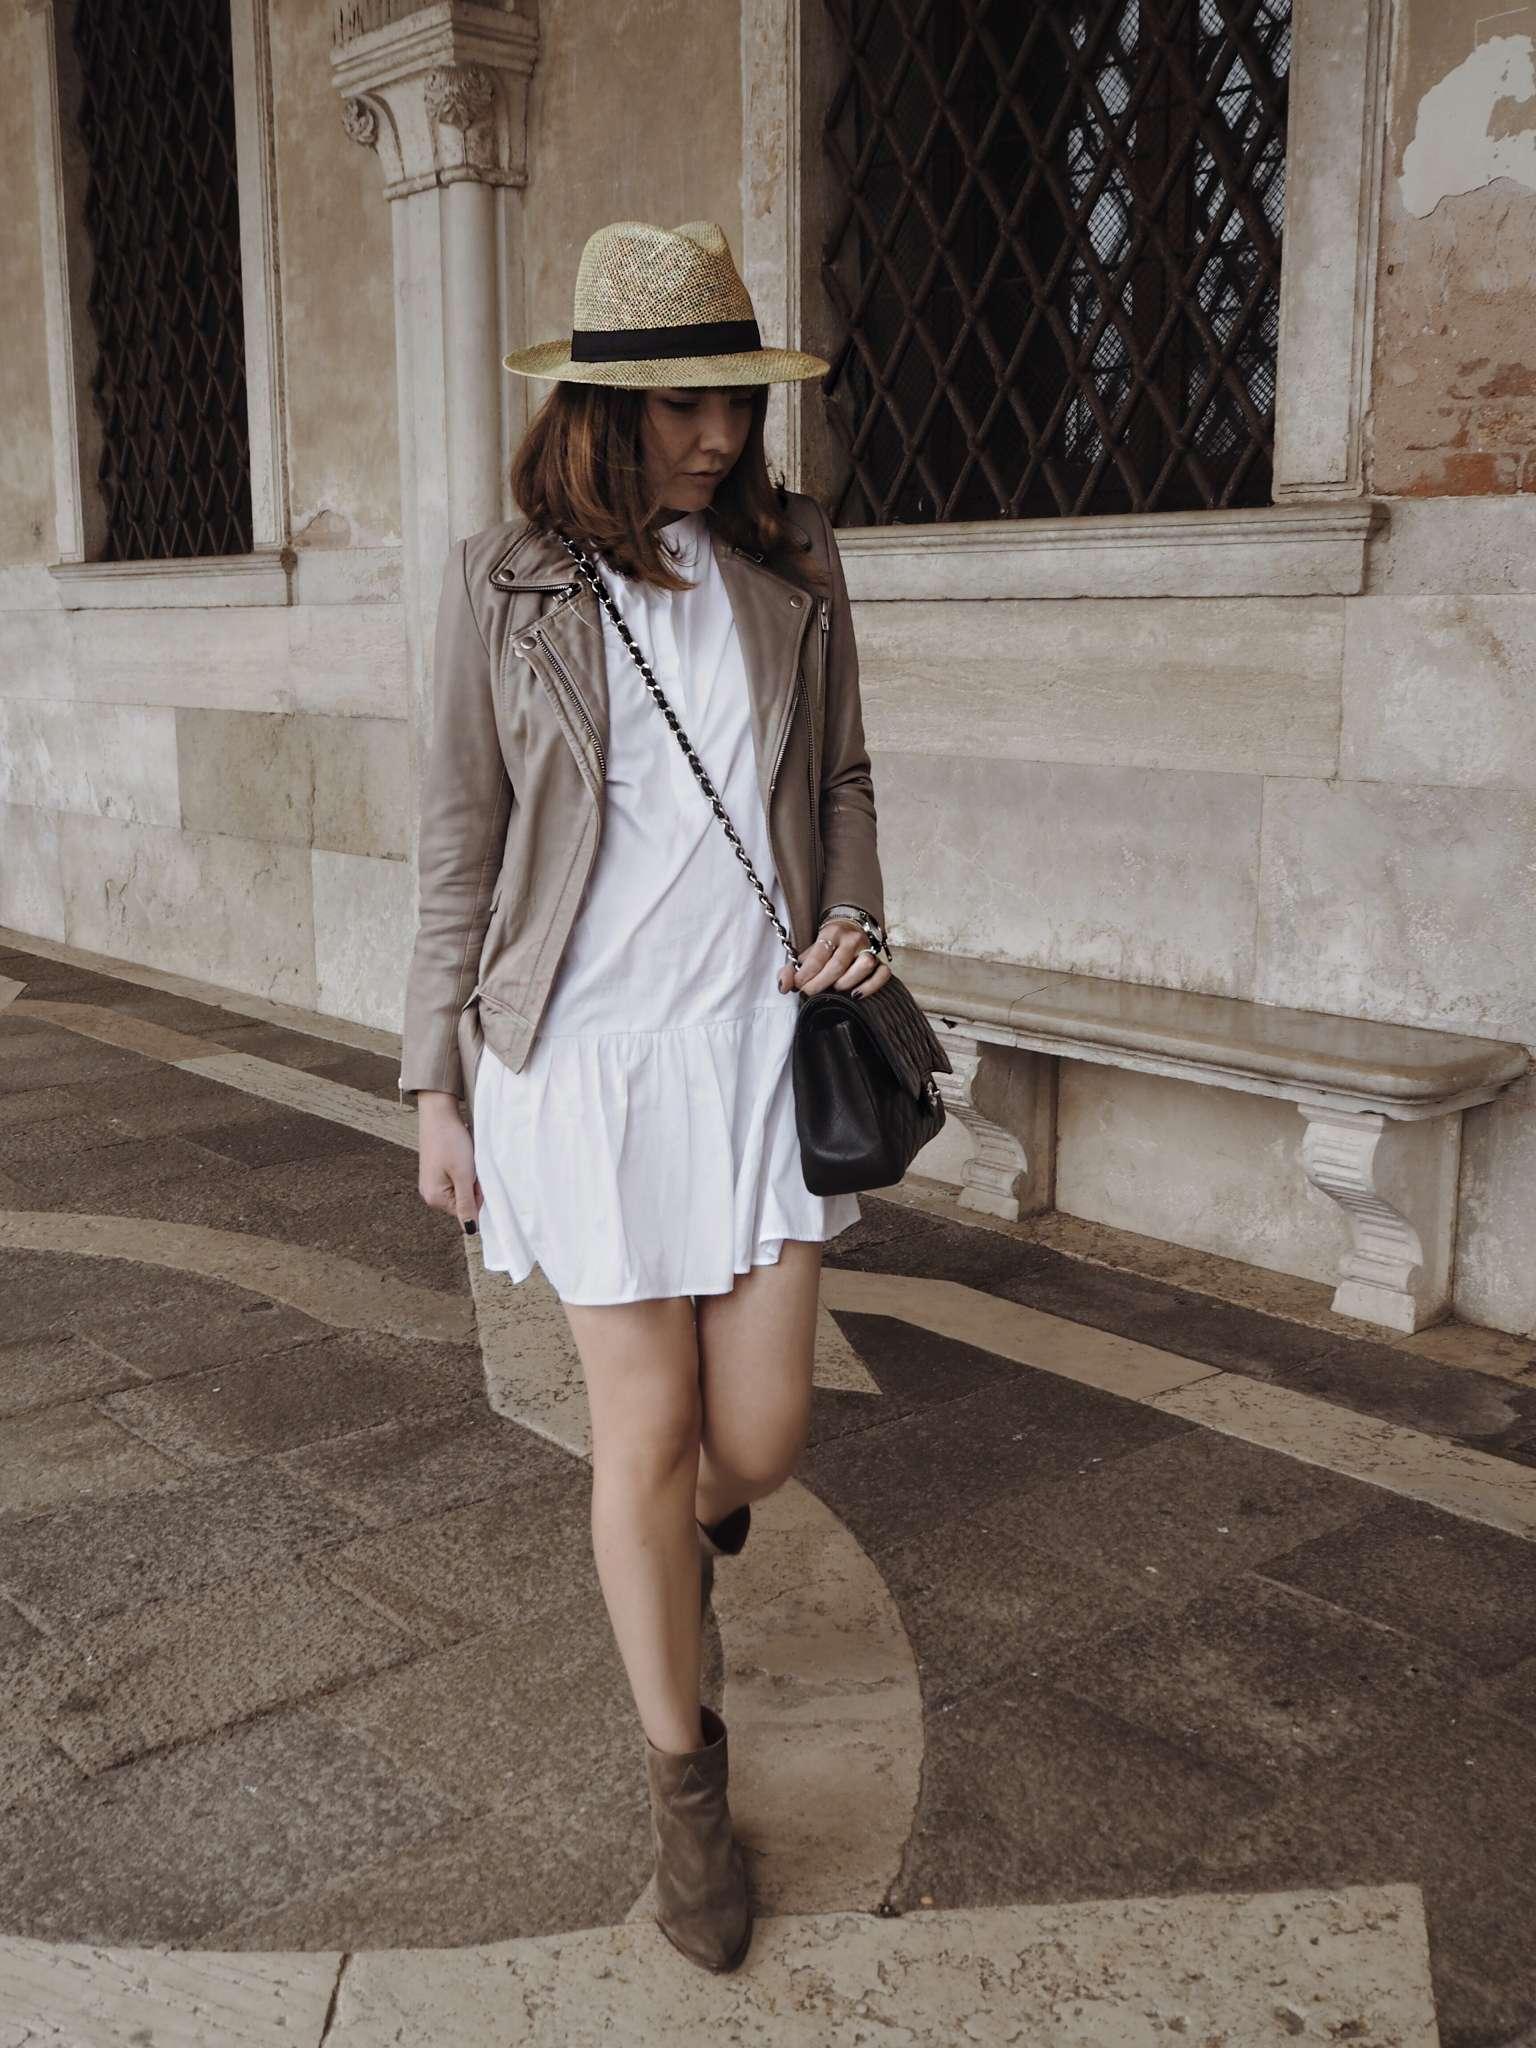 chanel-jumbo-dainty-jewelry-laura-gravestock-leather-jacket-lemonb-nicole-vienna-shirt-dress-silver-jewellery-white-dress-white-shirt-spring-summer-trends